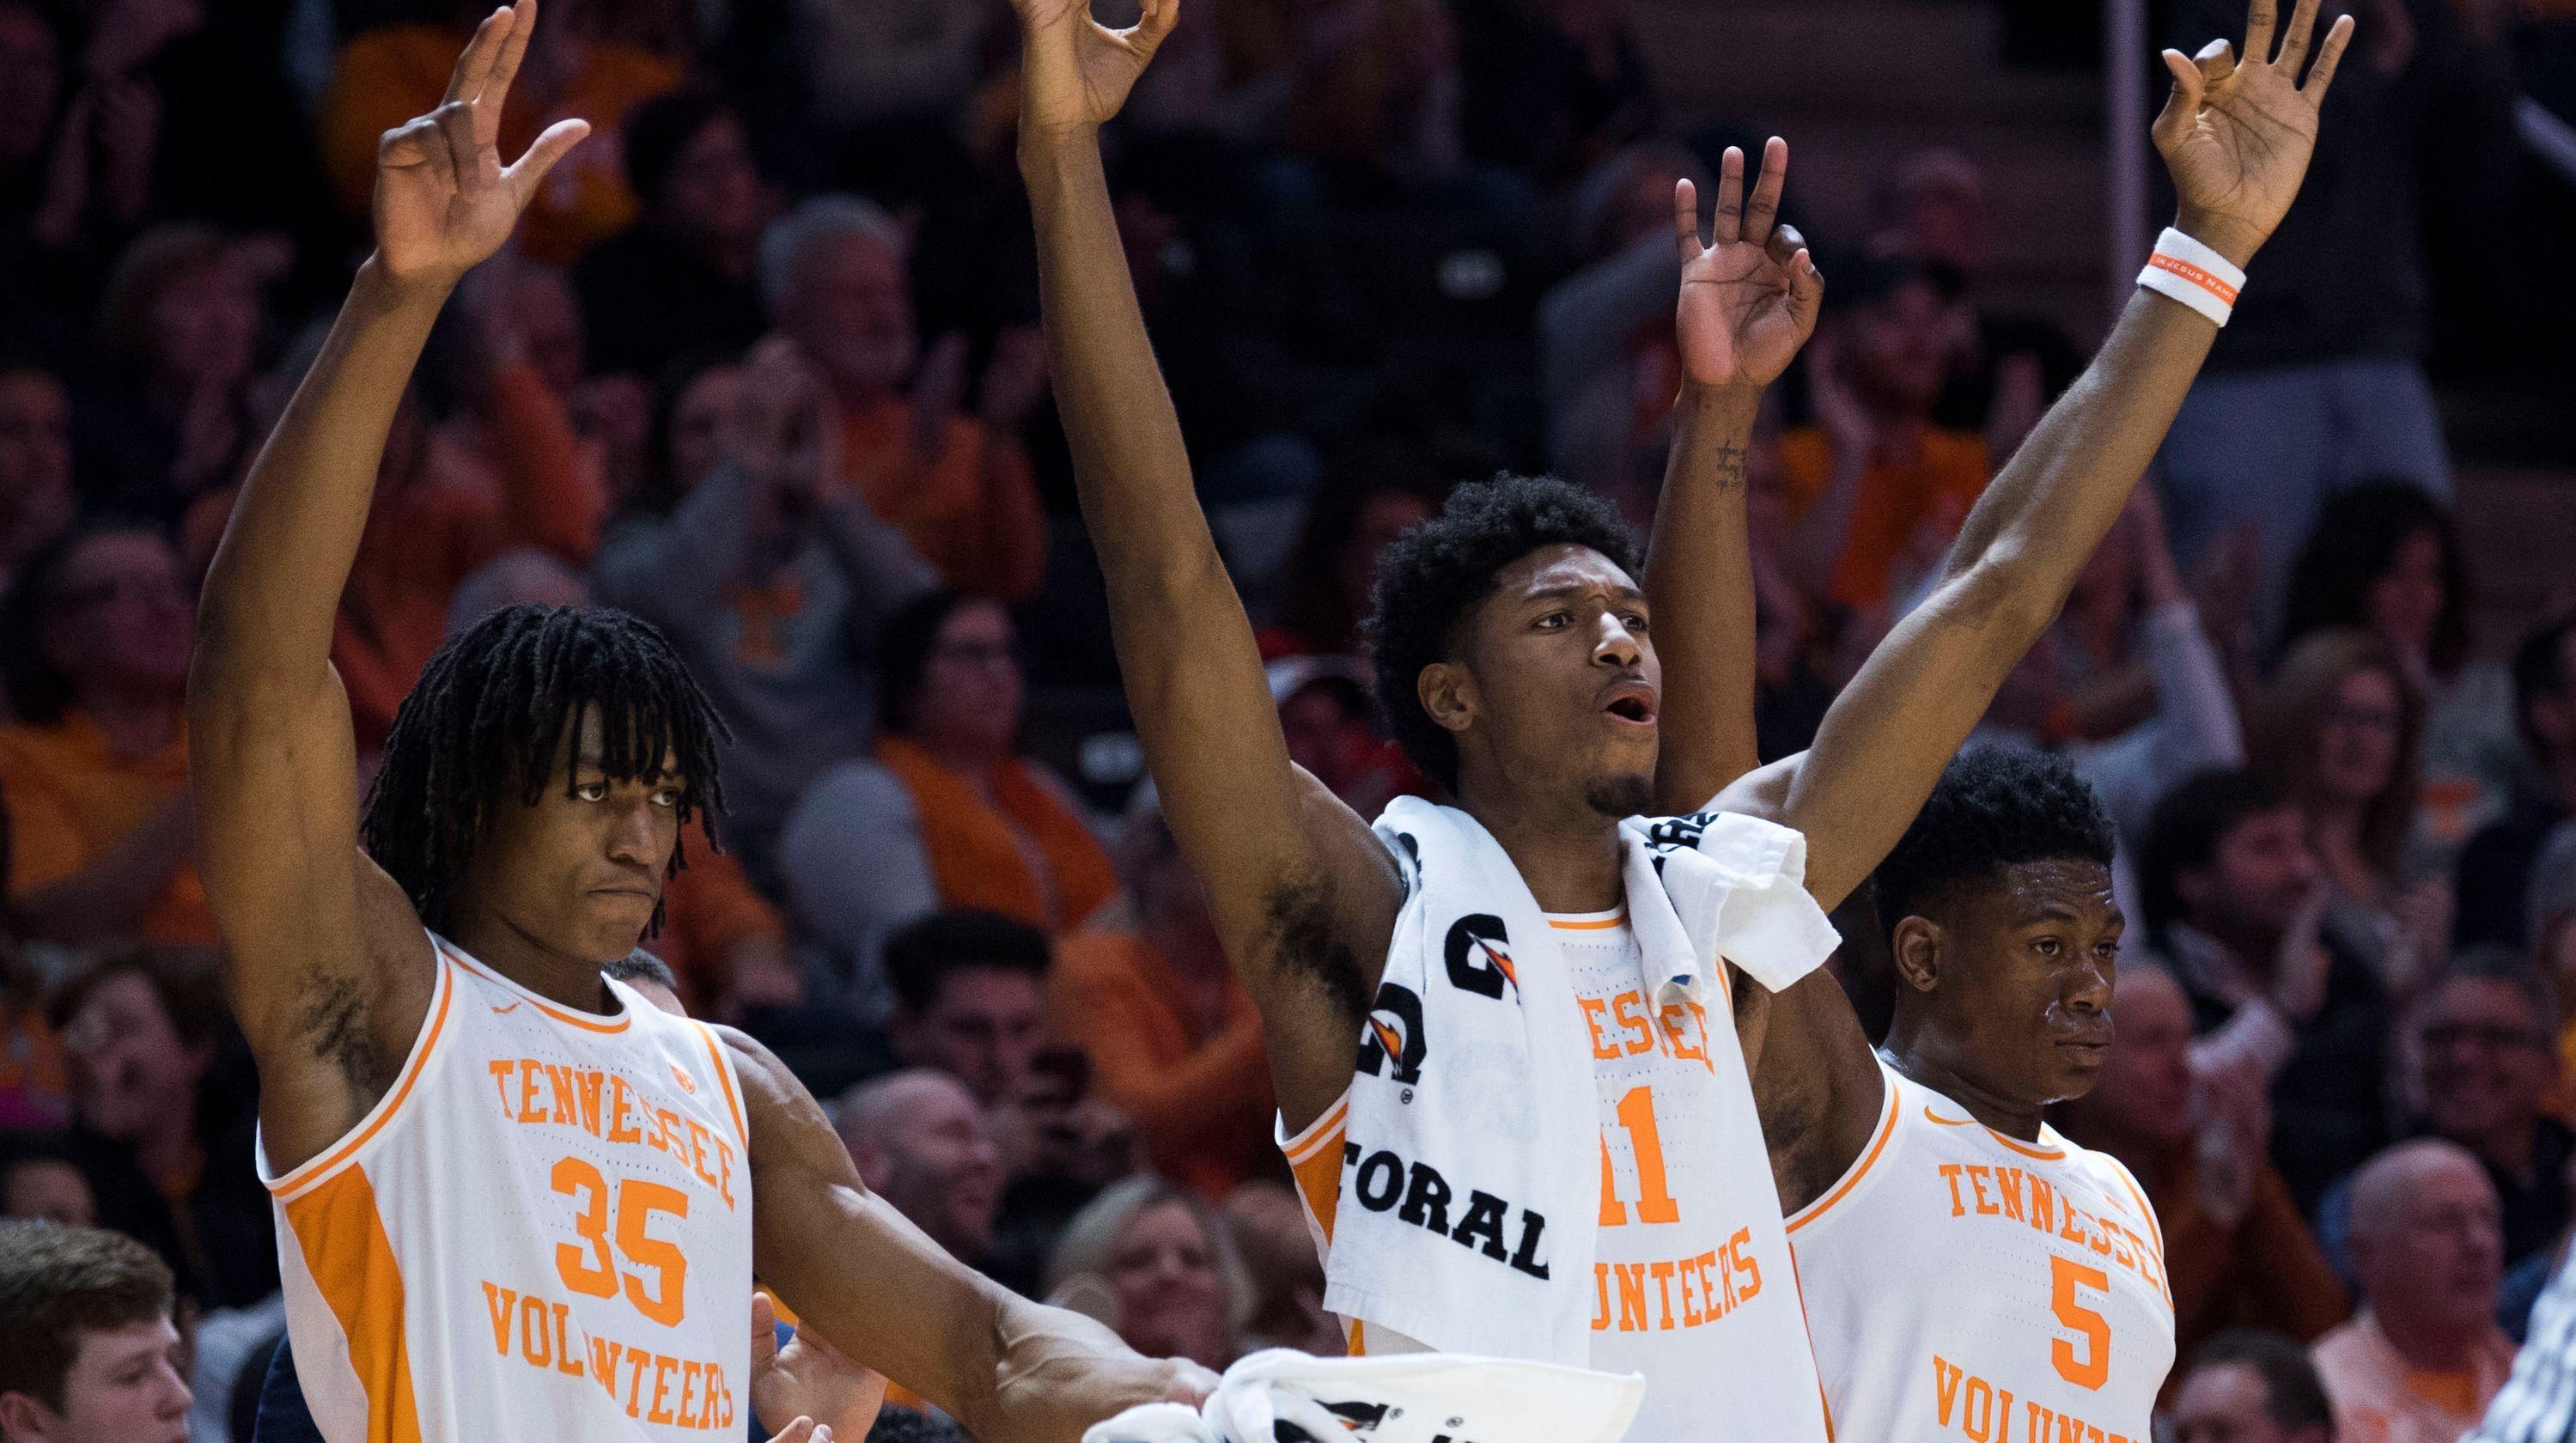 TGTN College Basketball Top 25 (3/4/19) College